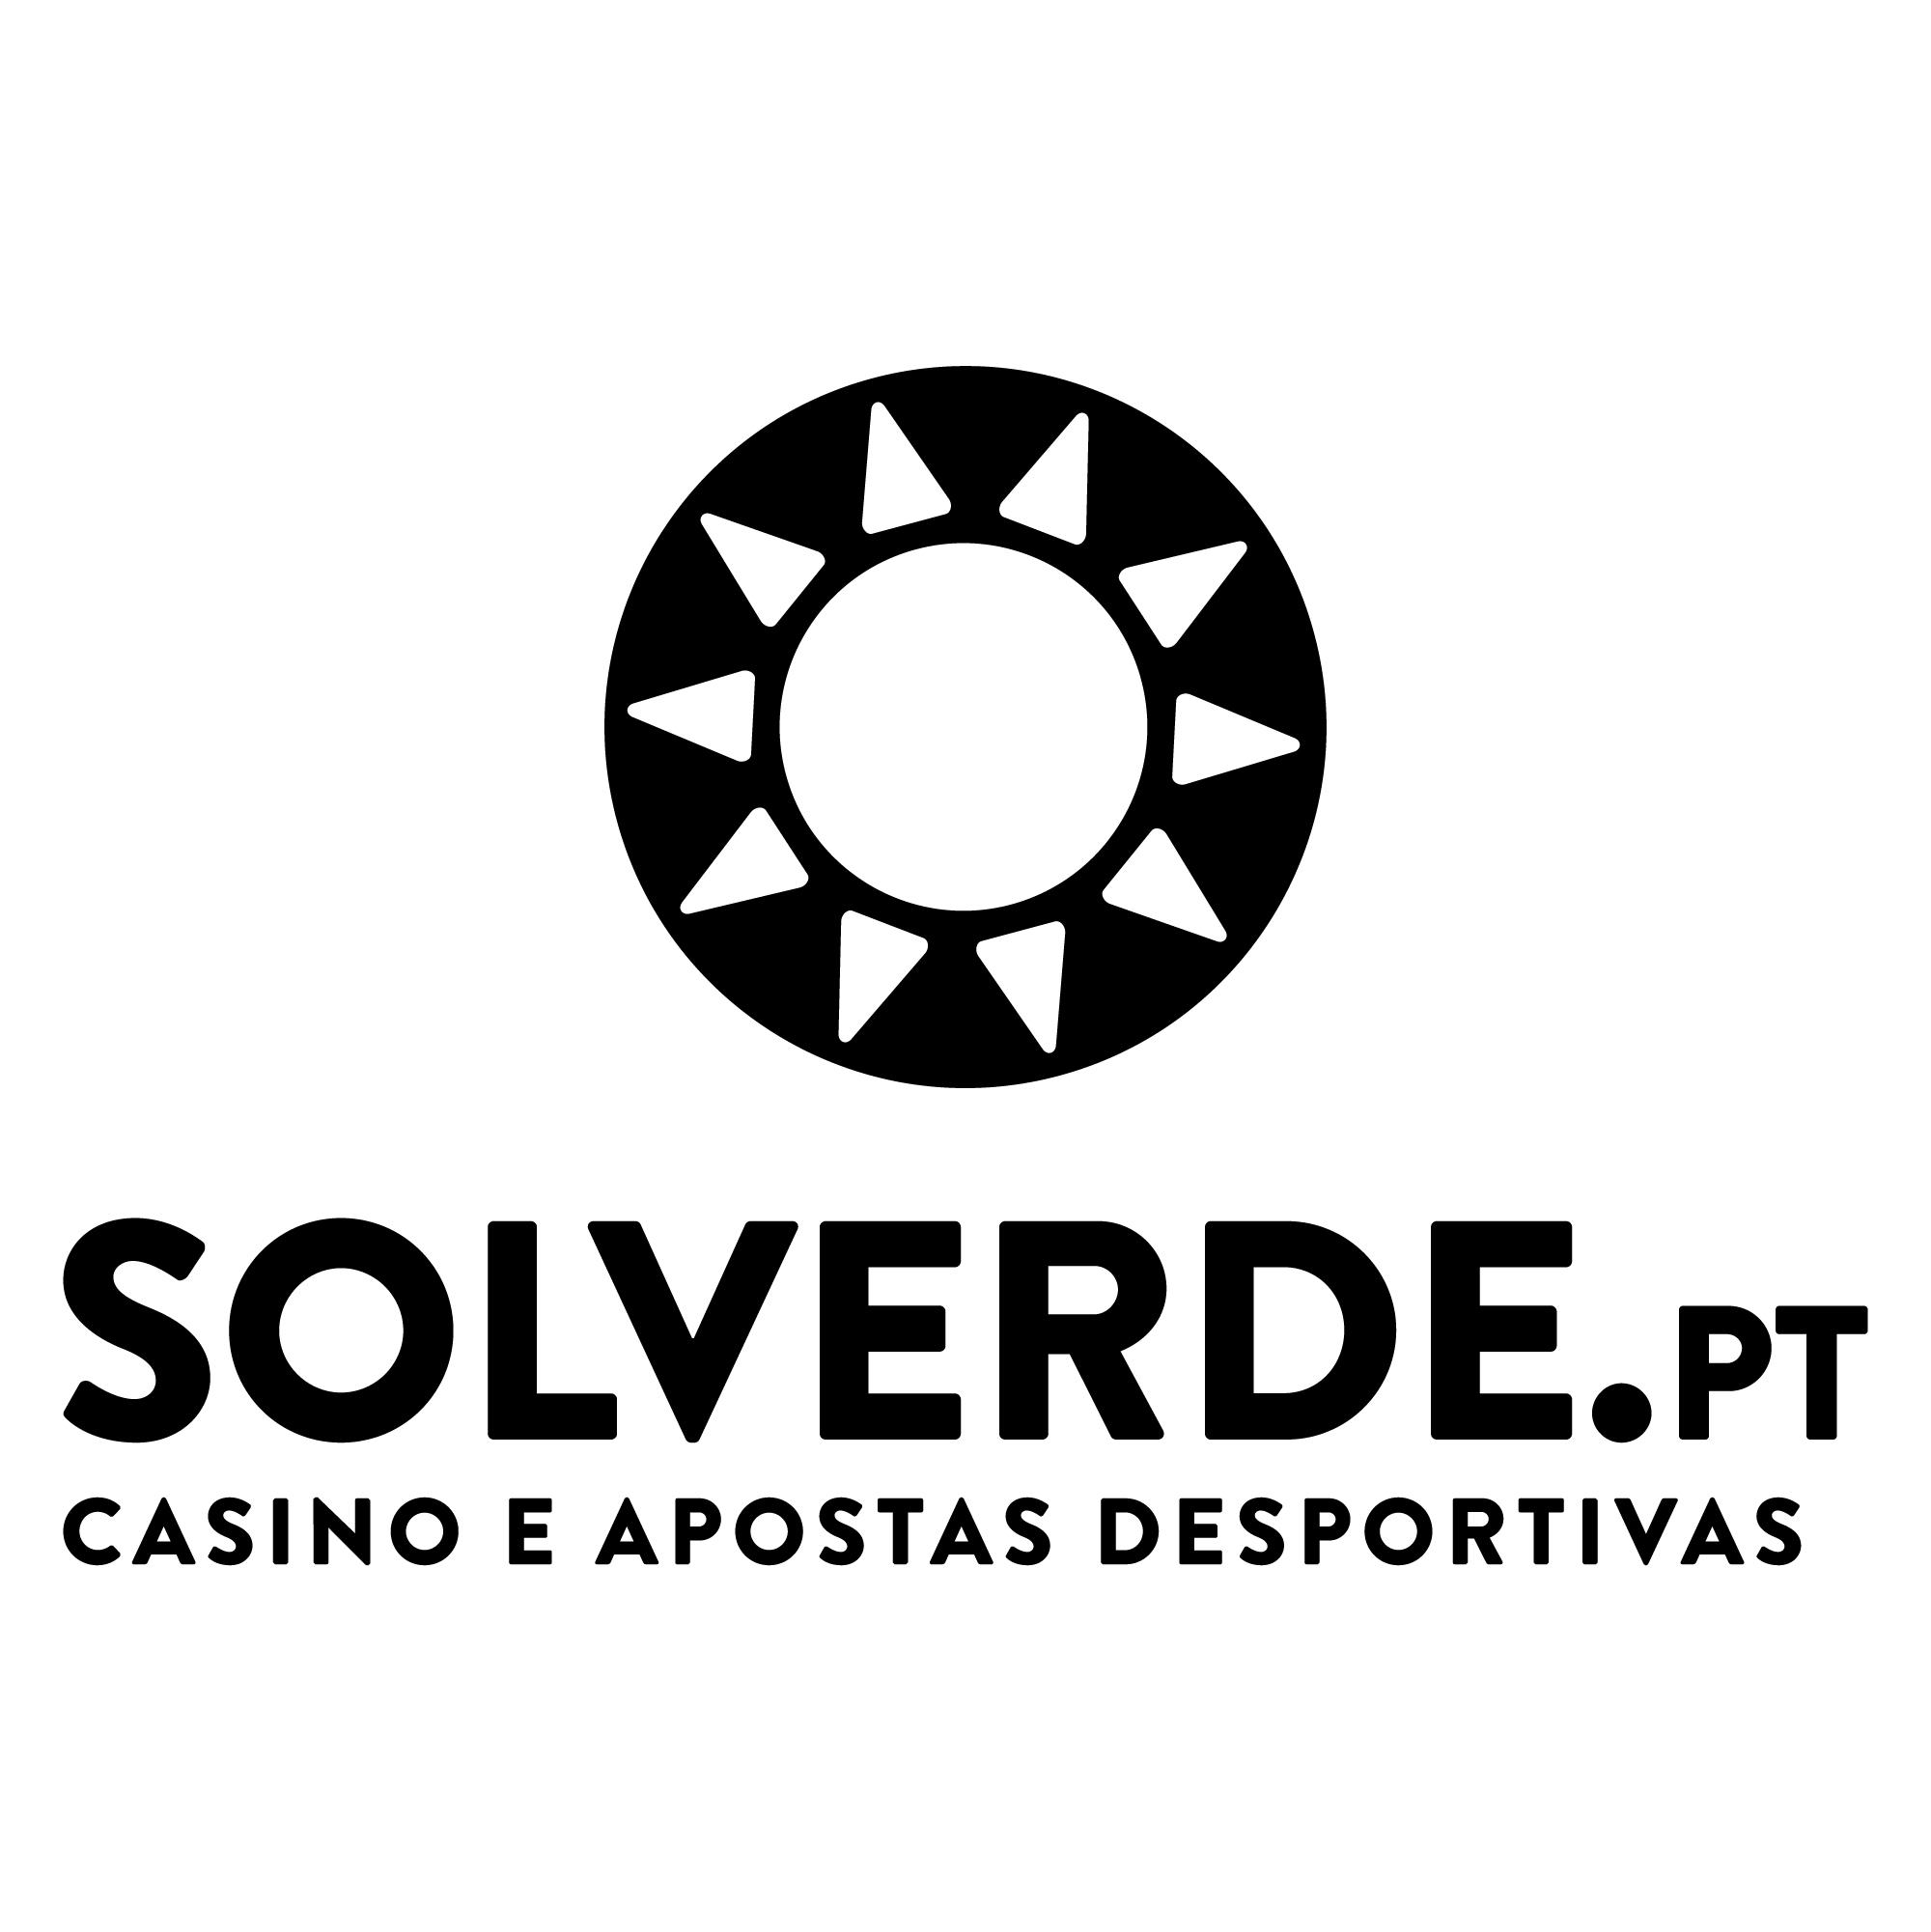 Solverde.pt